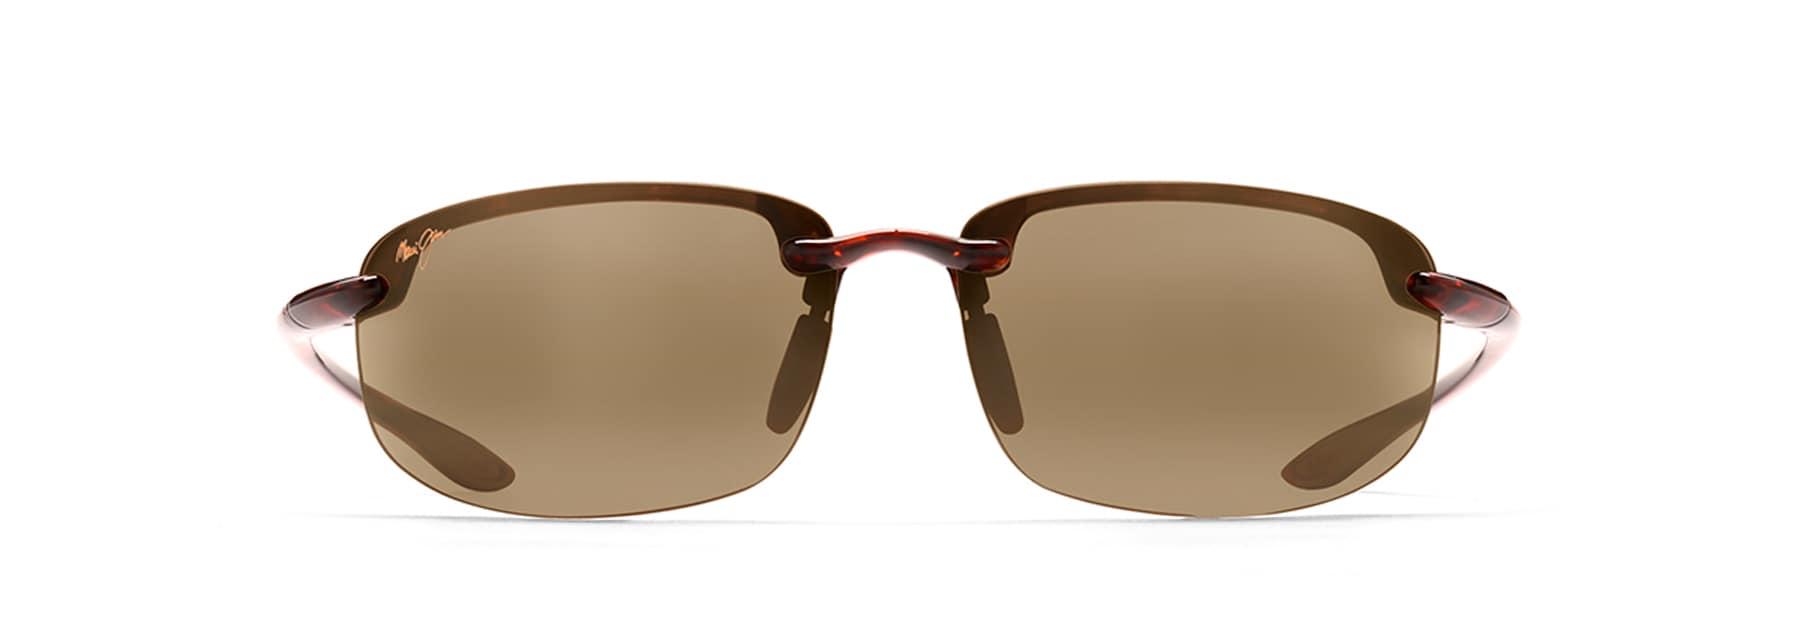 9b8b9bb61e Ho'okipa Reader Polarized Sunglasses | Maui Jim®